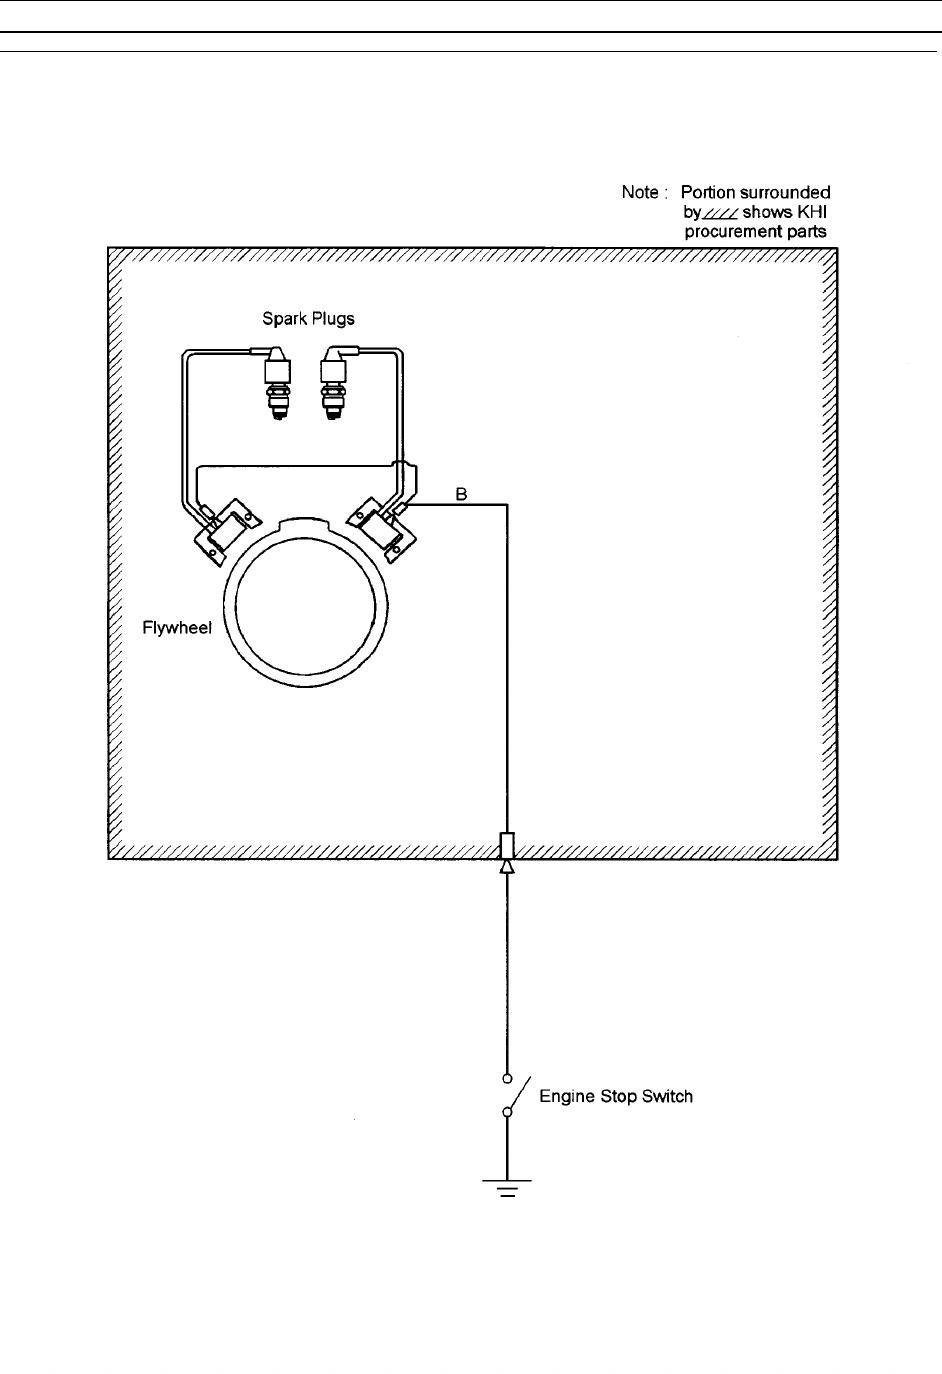 medium resolution of kawasaki fh451v fh500v fh531v fh601v fh641v fh680v fh721v service manual page 117